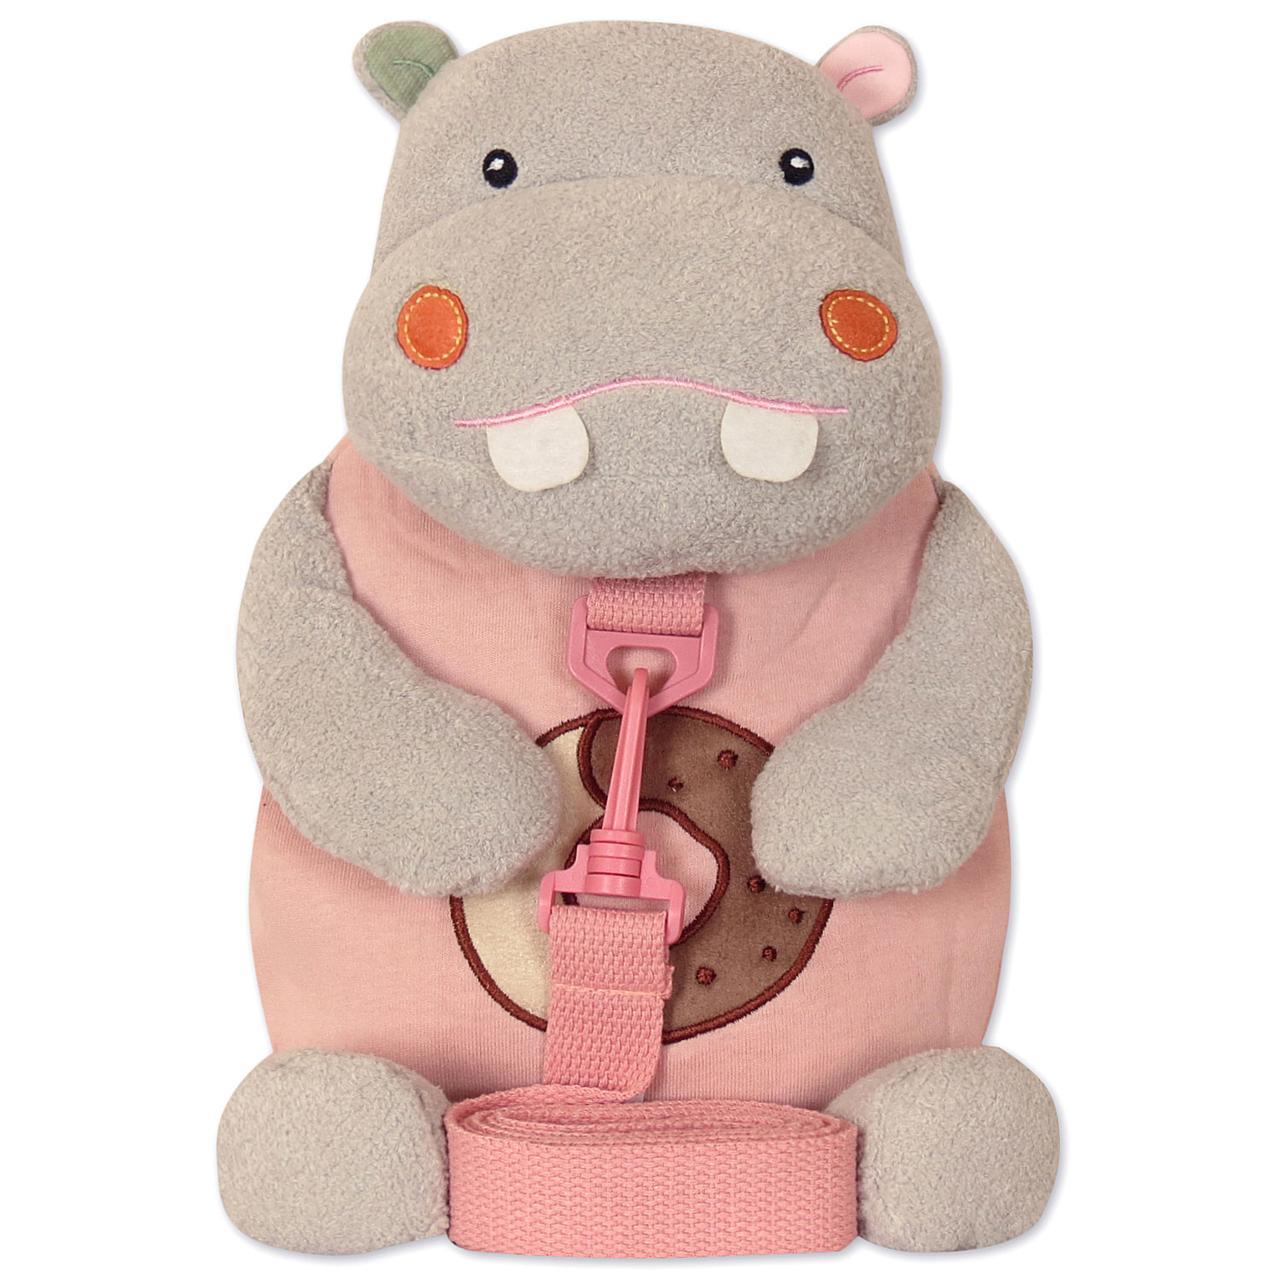 Детский рюкзак - Бегемот - сладкоежка Metoo. рюкзак игрушка